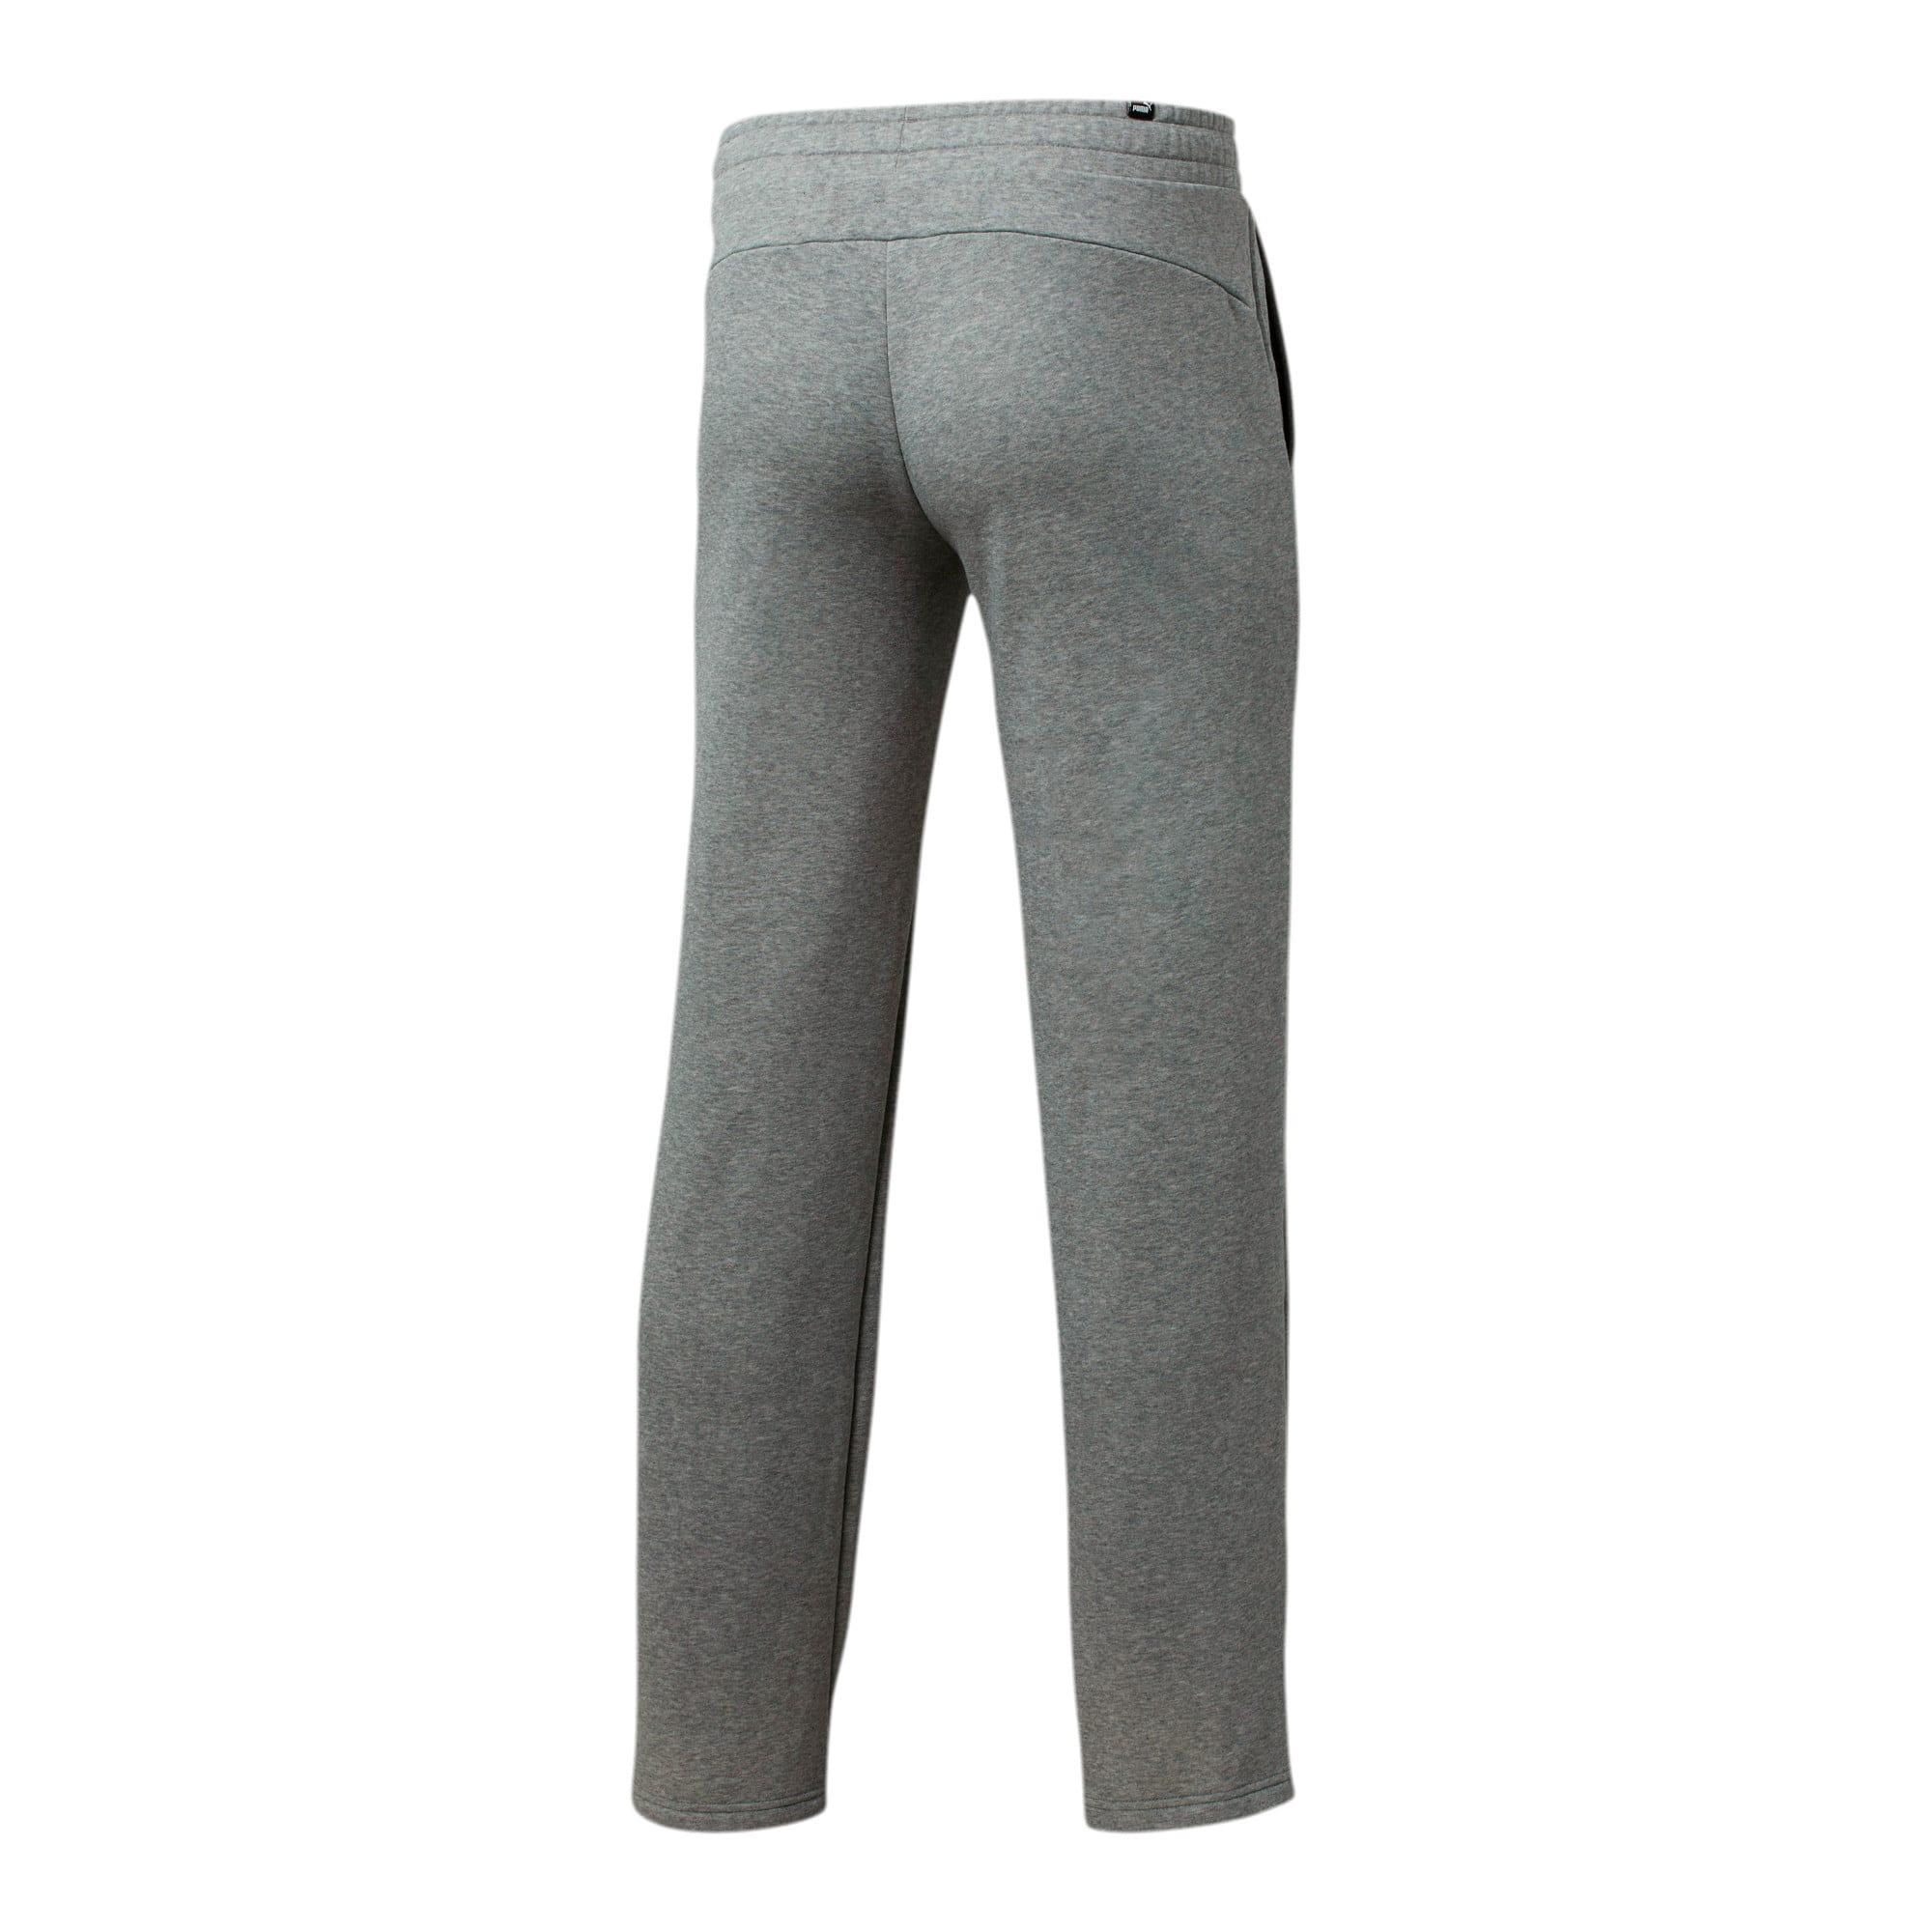 Thumbnail 2 of Essentials Men's Fleece Pants, Medium Gray Heather, medium